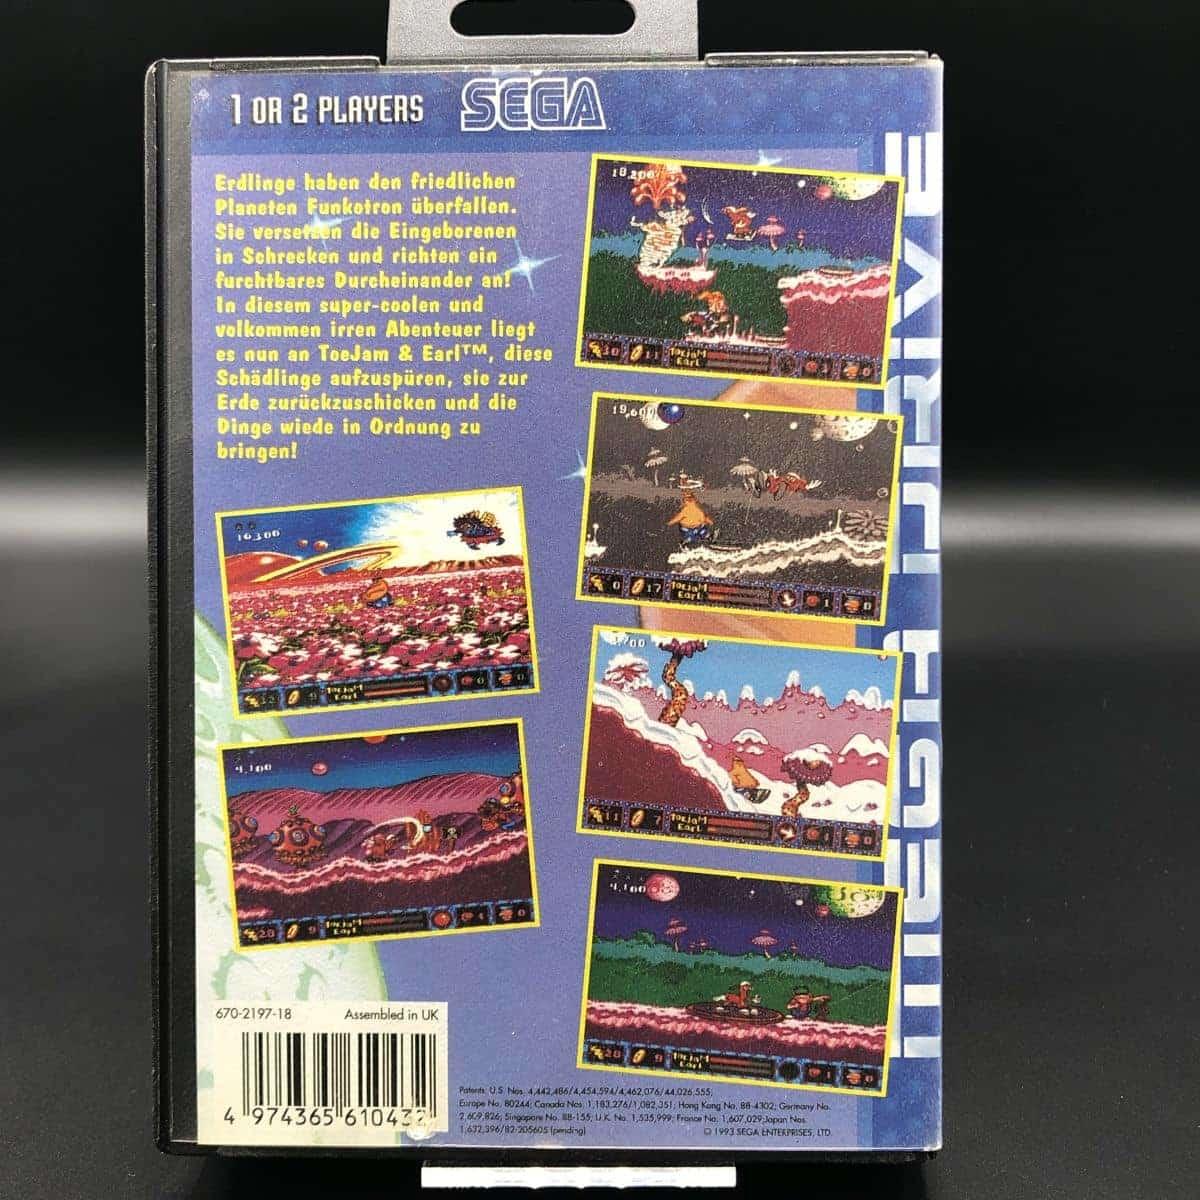 ToeJam & Earl in Panic on Funkotron (ohne Anleitung) (Gut) Sega Mega Drive